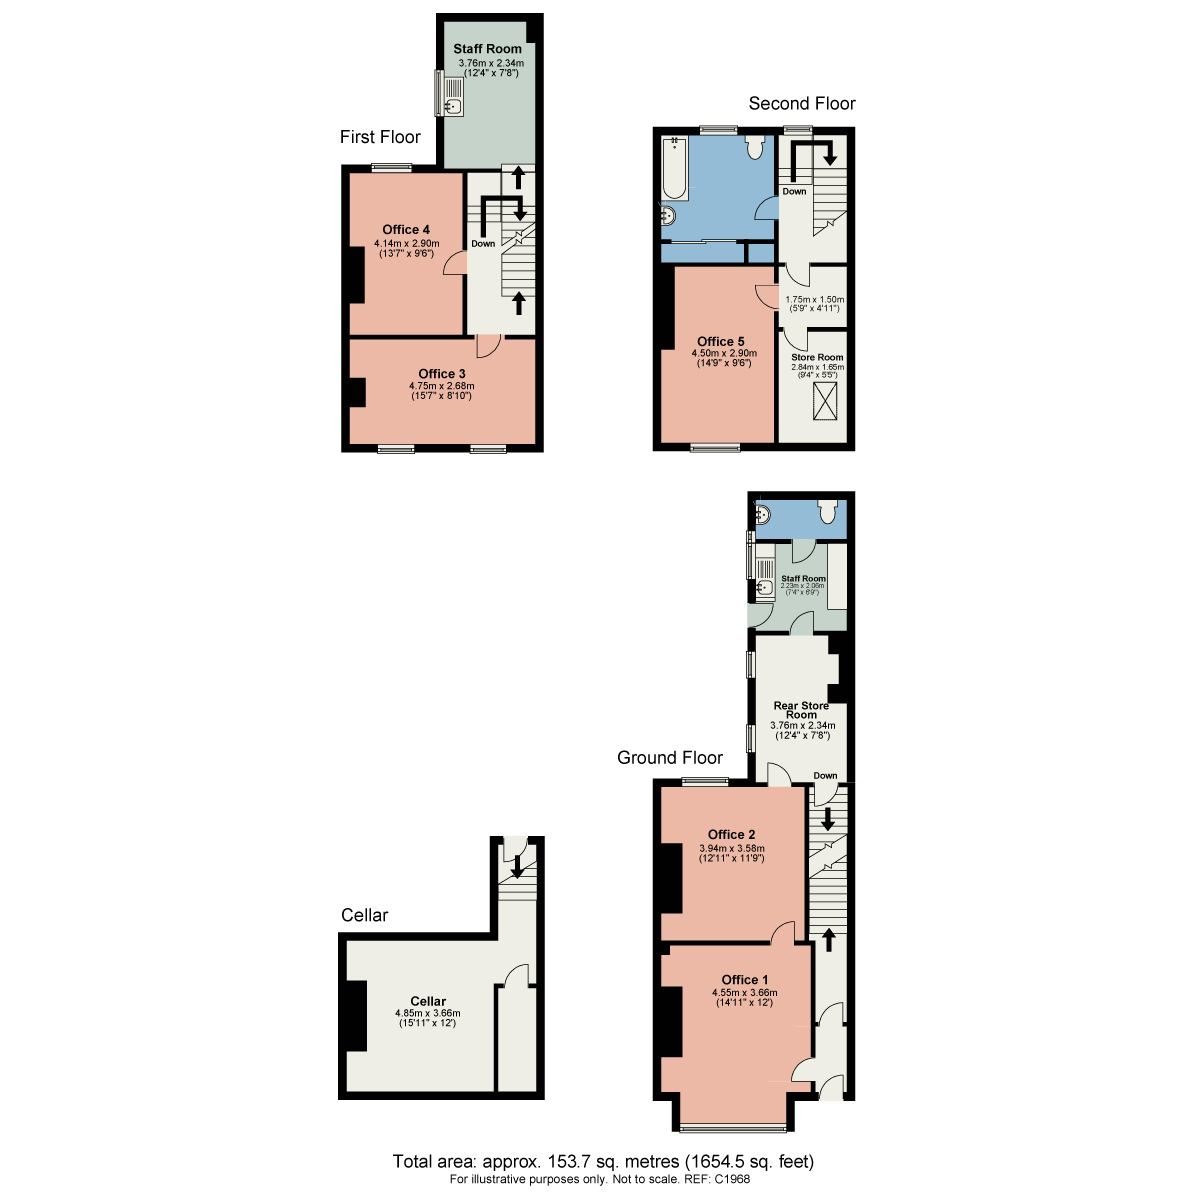 Floorplan New Street, Carnforth, Lancashire, LA5 9BX